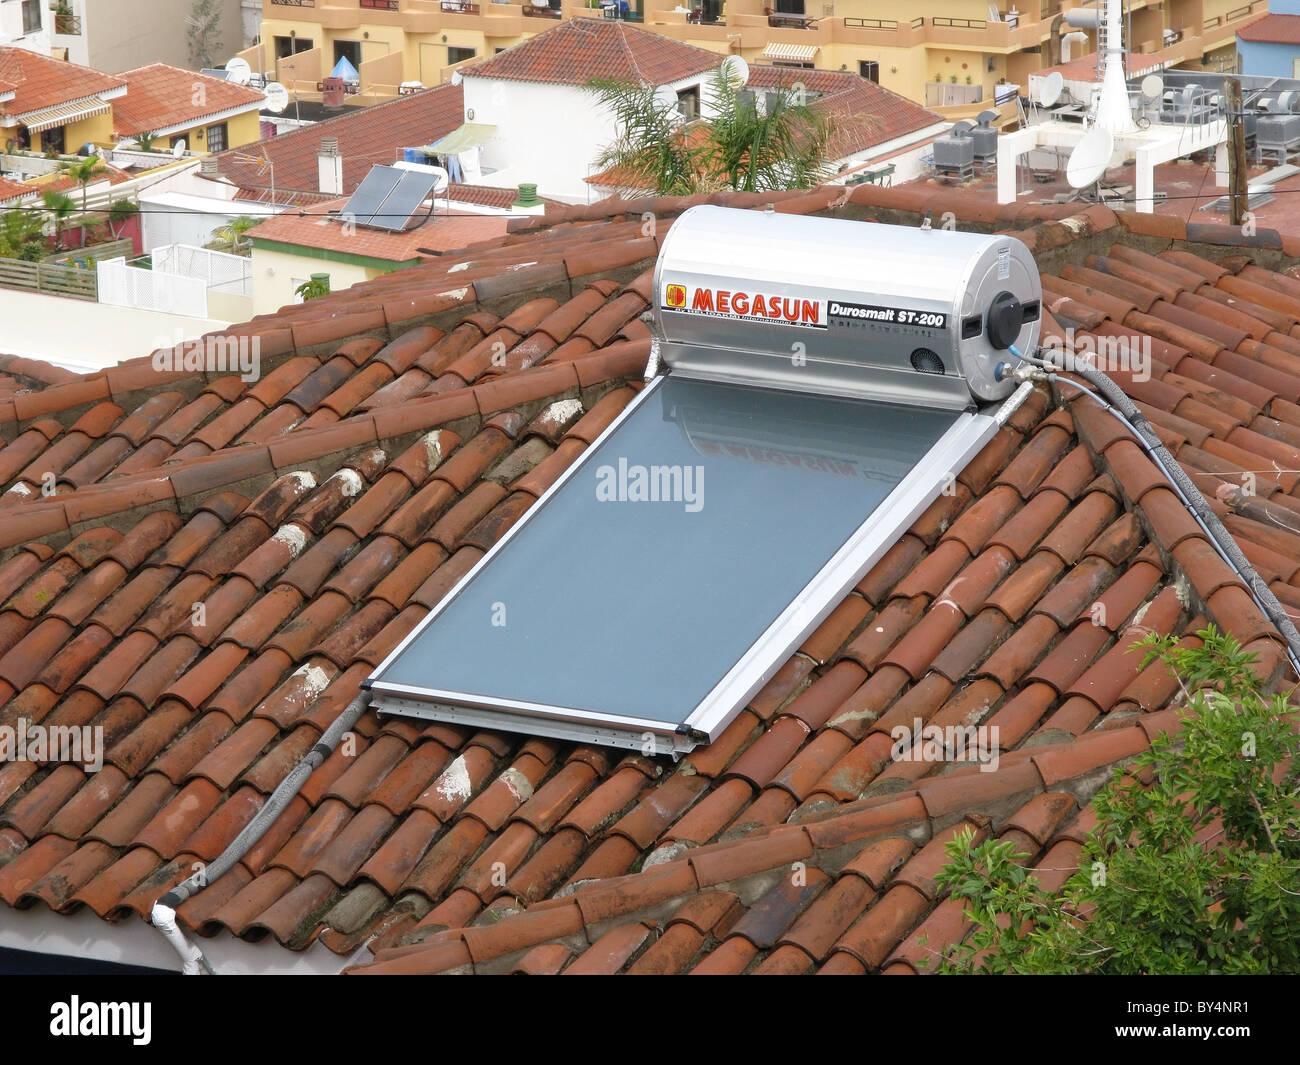 Megasun Durosmalt St 200 Solar Water Heater On A Roof